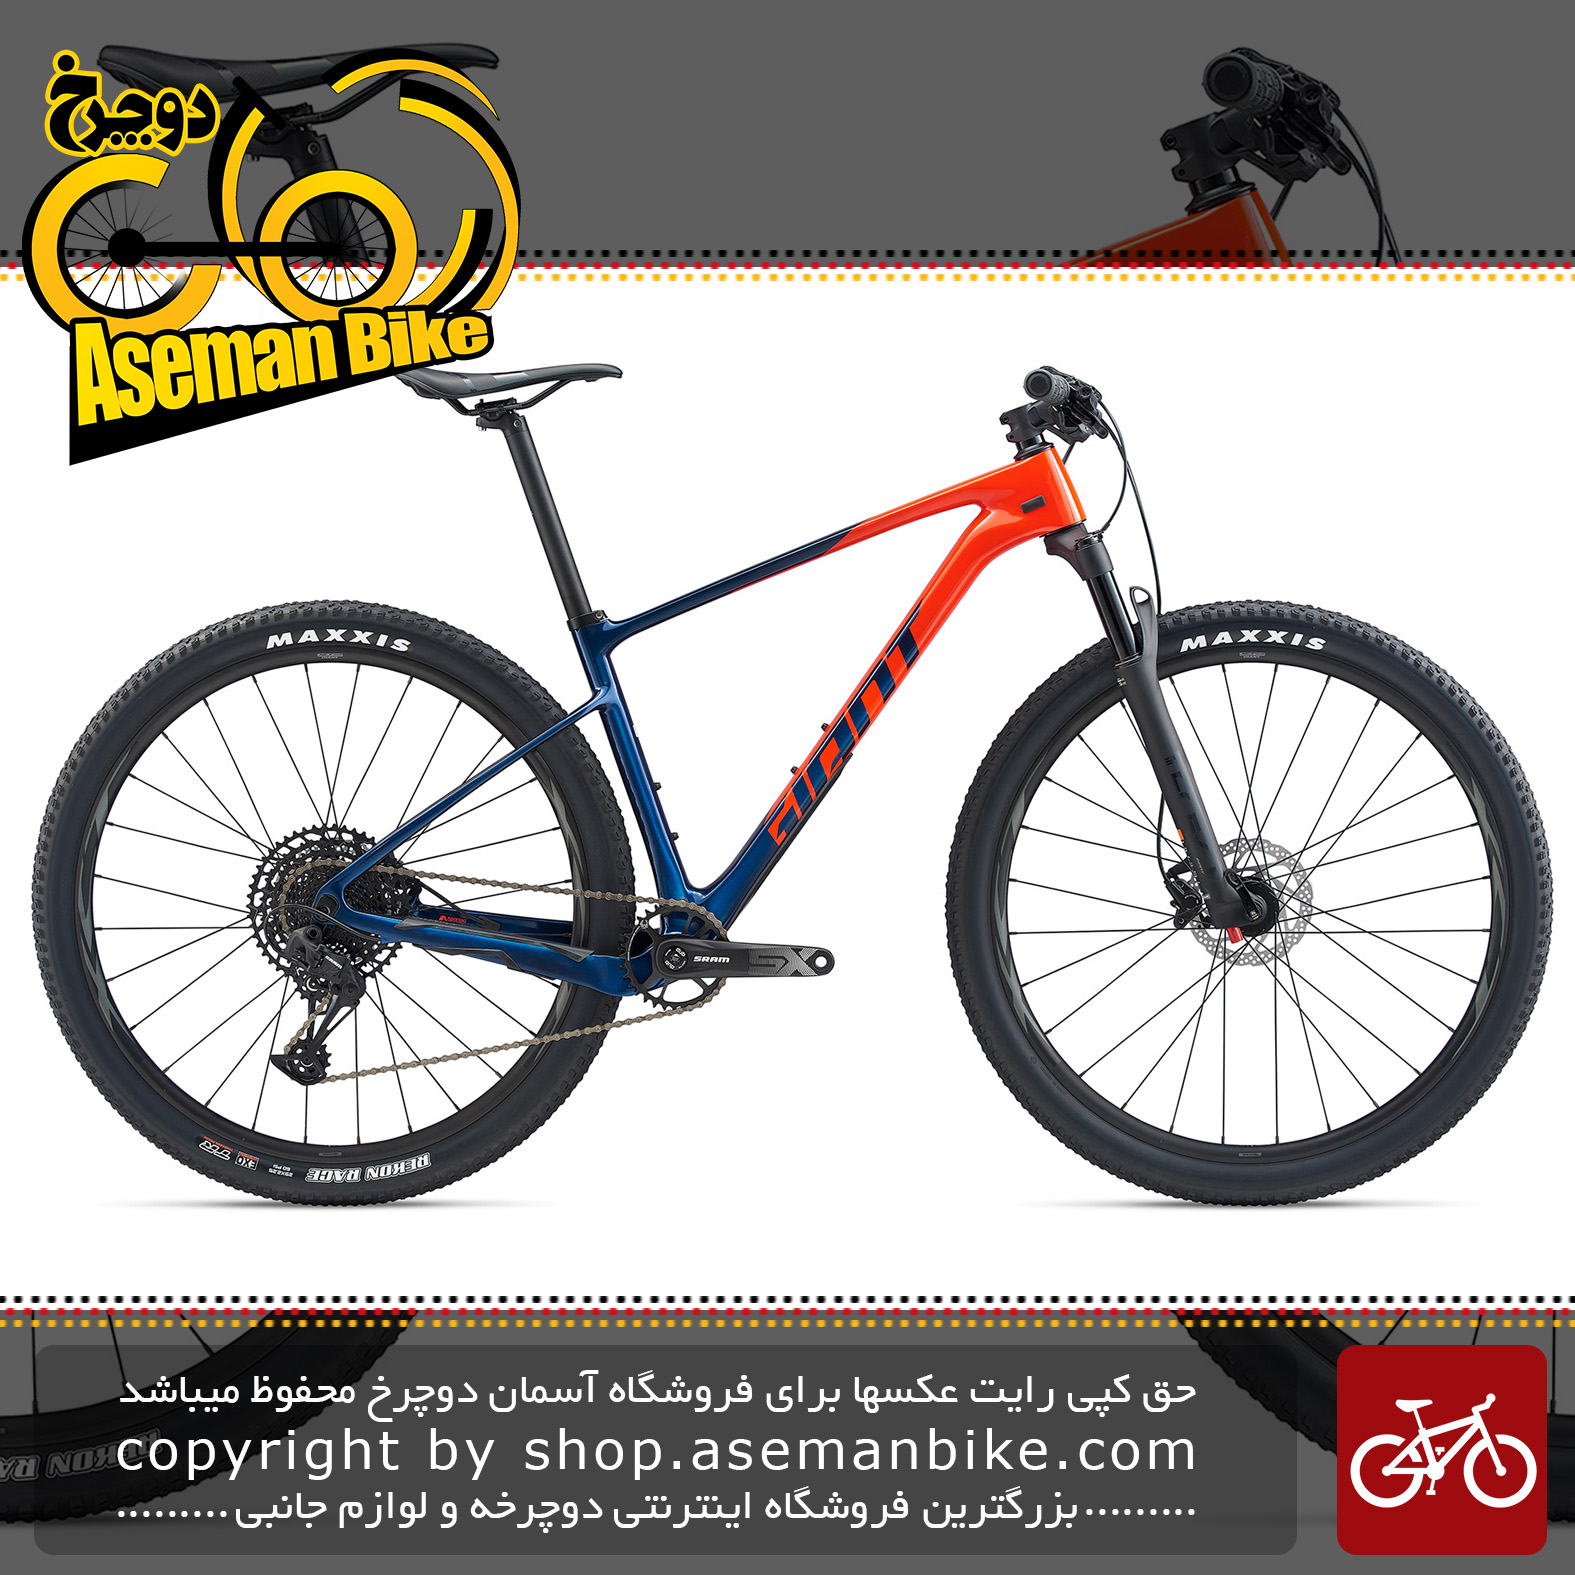 دوچرخه کوهستان جاینت مدل ایکس تی سی ادونس 29 اینچ 3 2020 Giant Mountain Bicycle XTC Advanced 29 3 2020